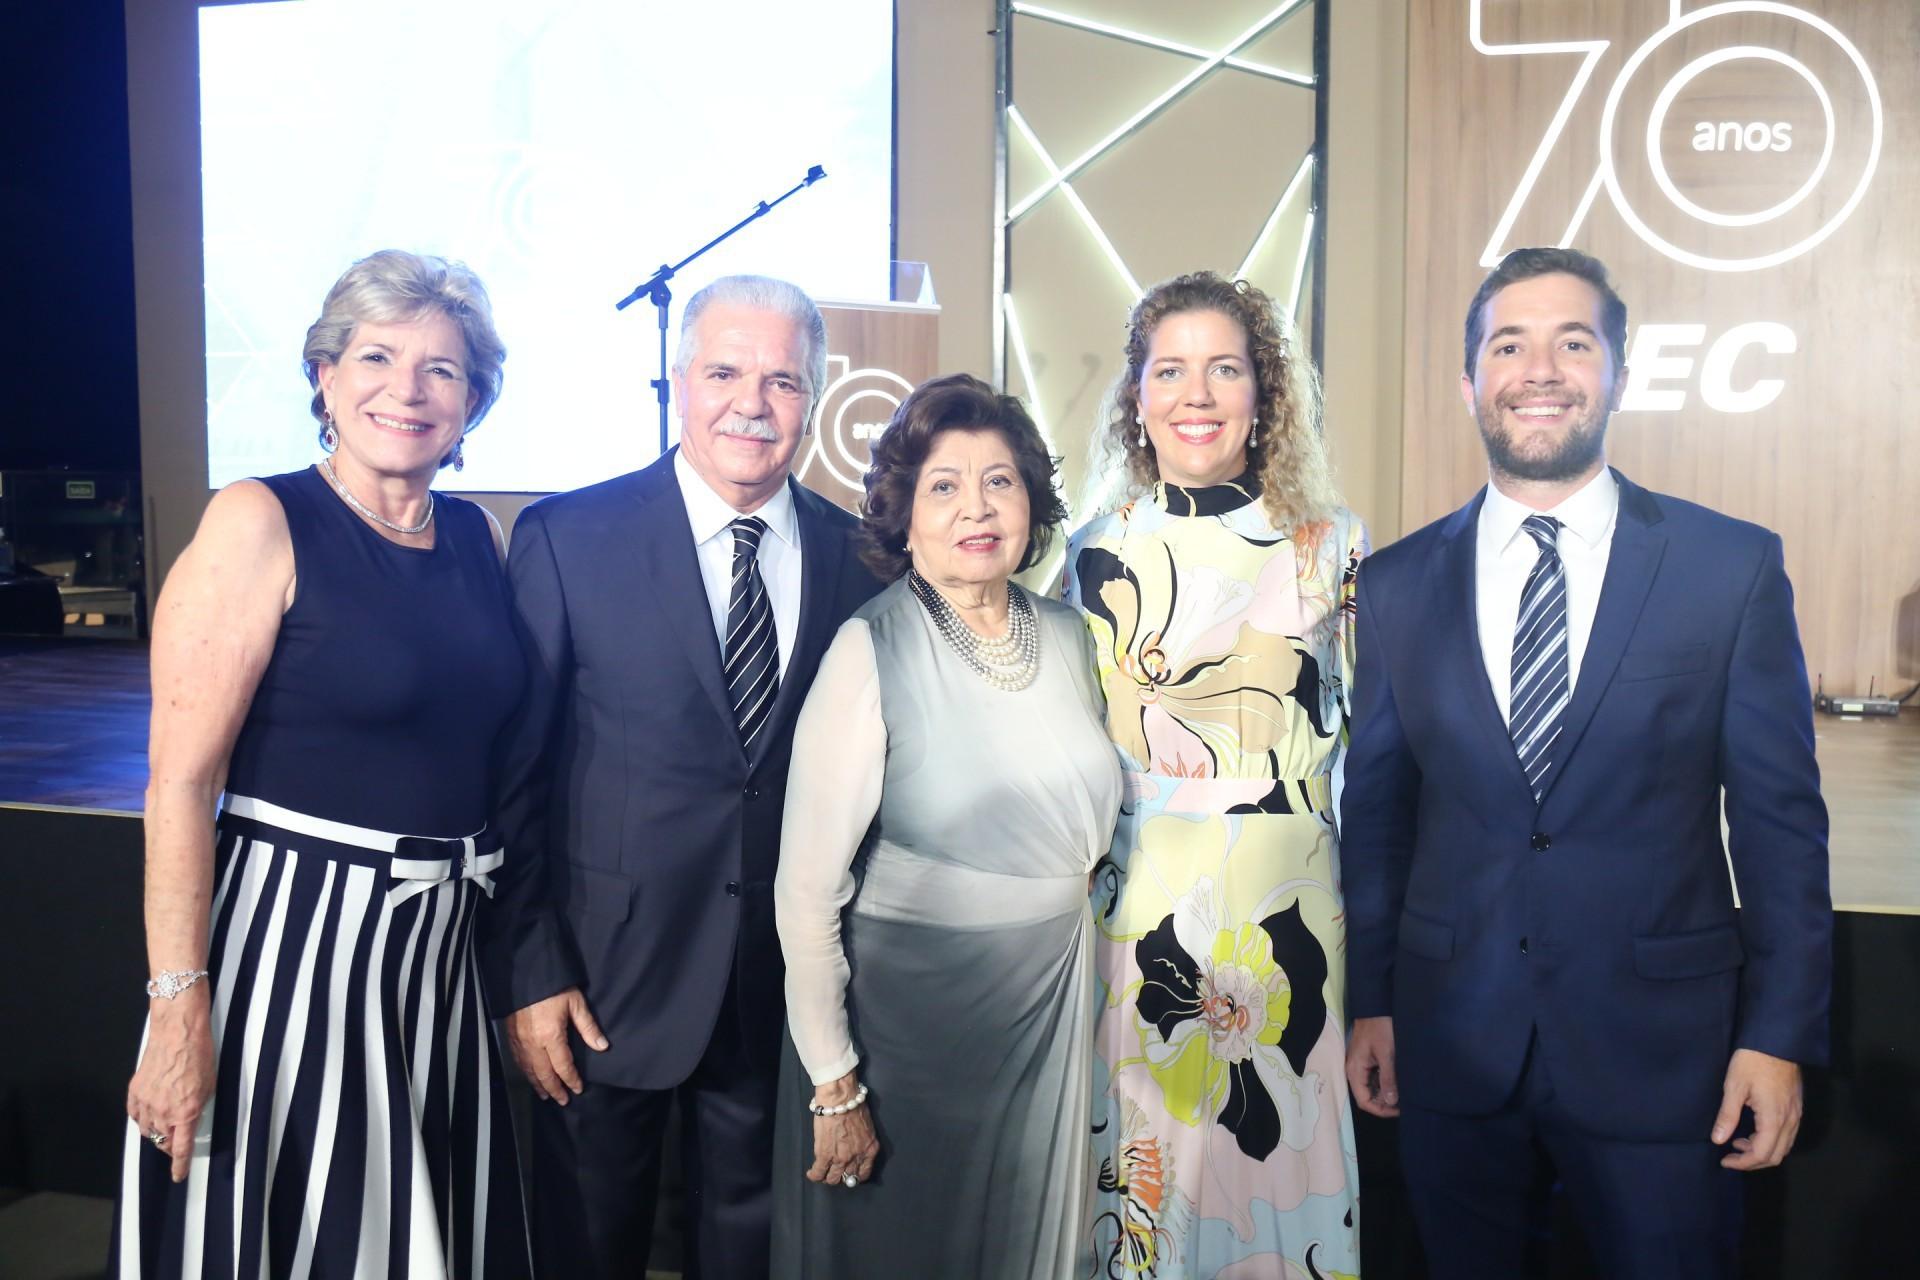 (Foto: JOAO FILHO TAVARES)Stella, Pio, Edir, Ticiana e Guilherme Rolim